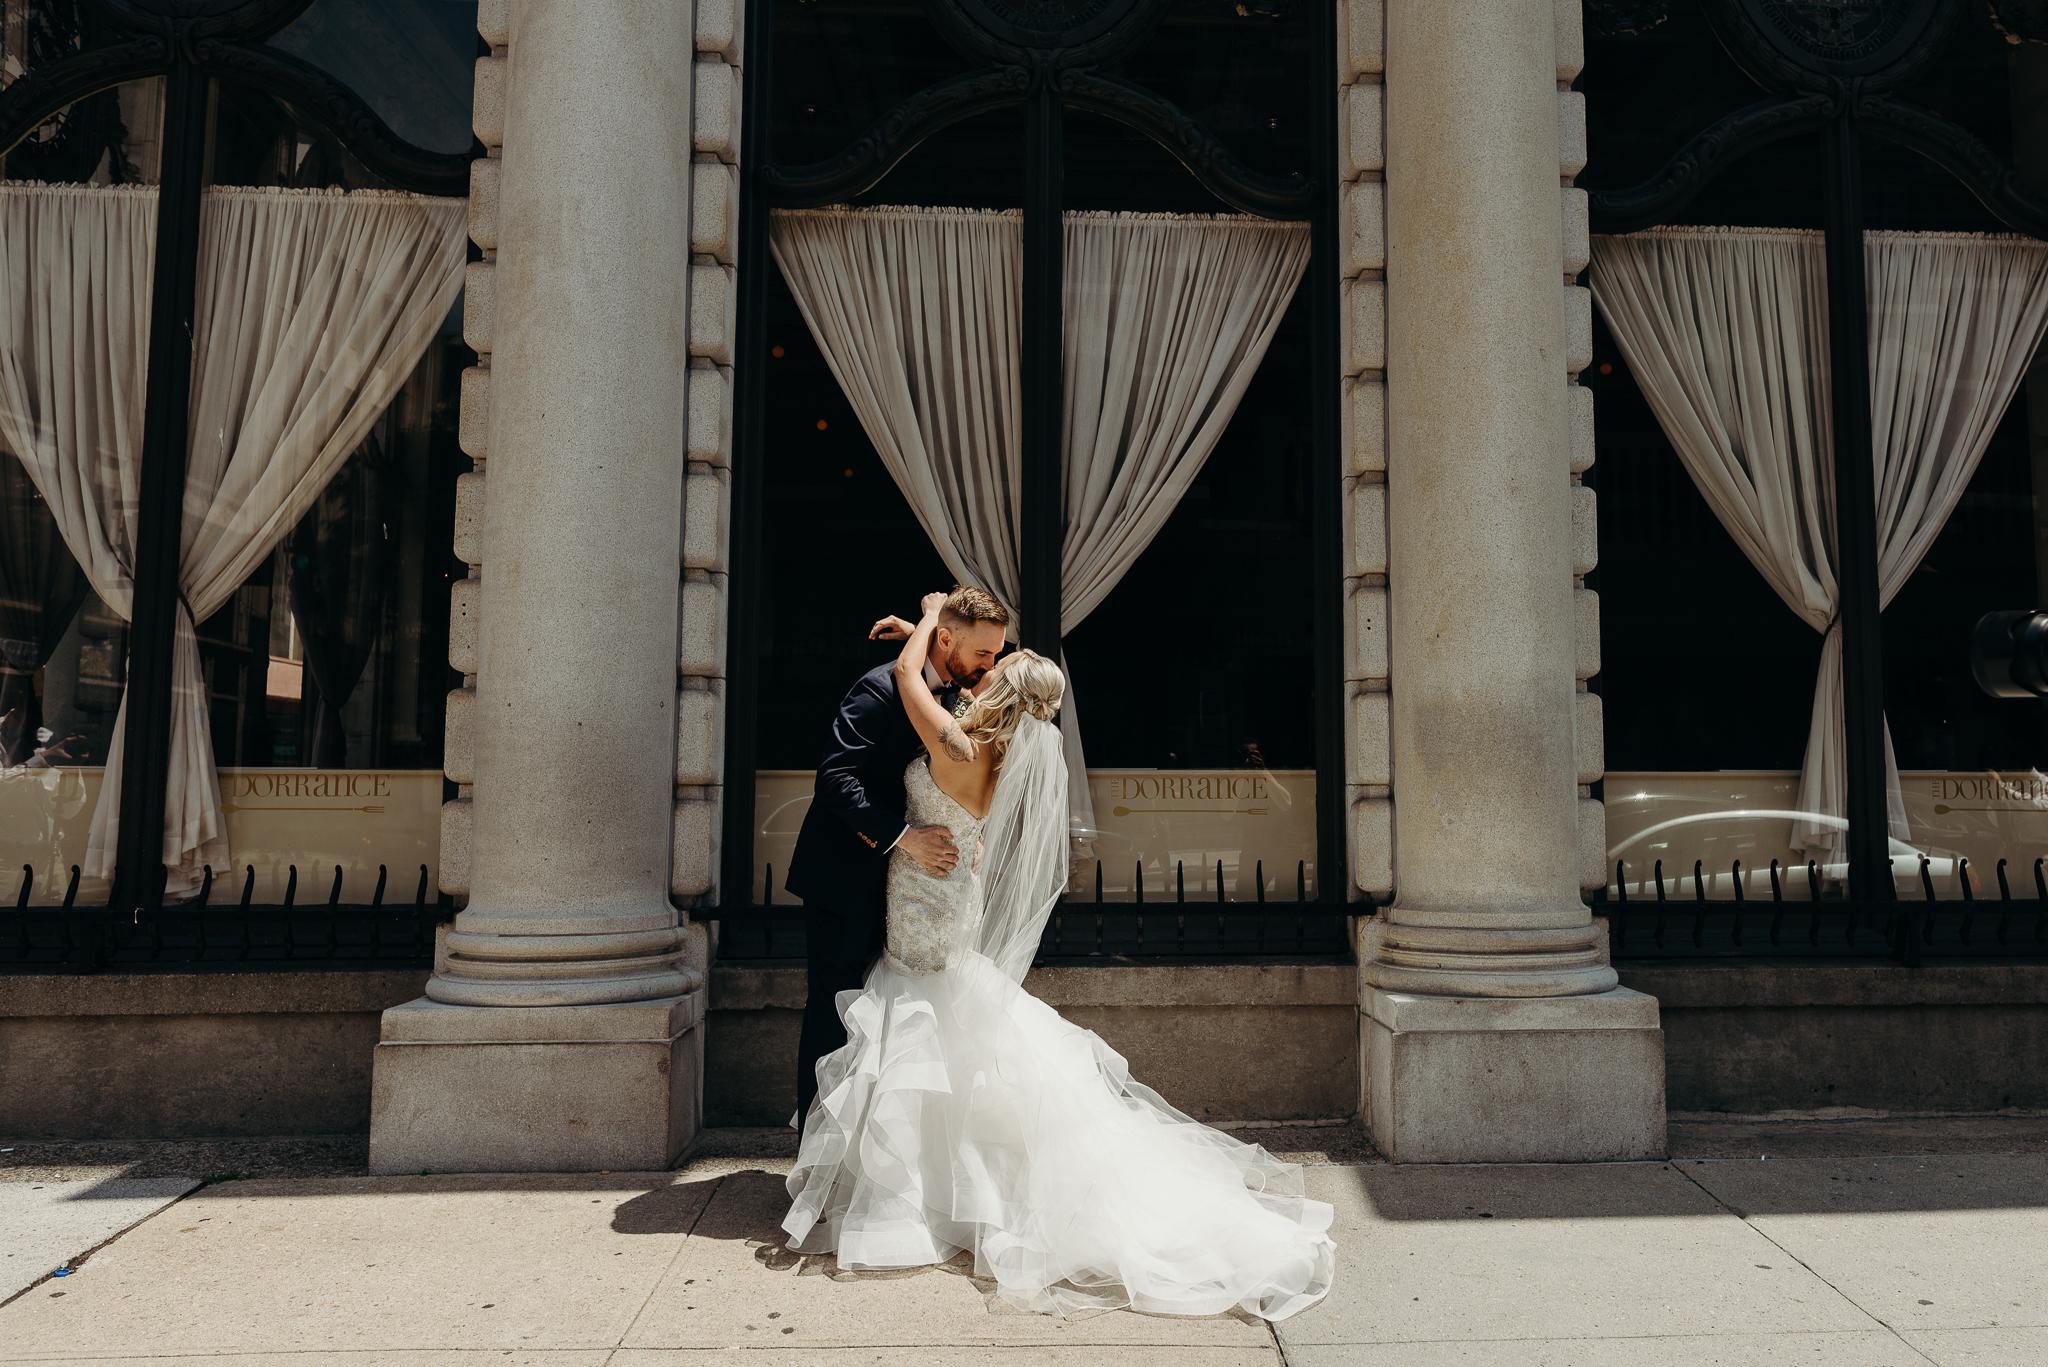 downtownprovidencewedding-14.jpg